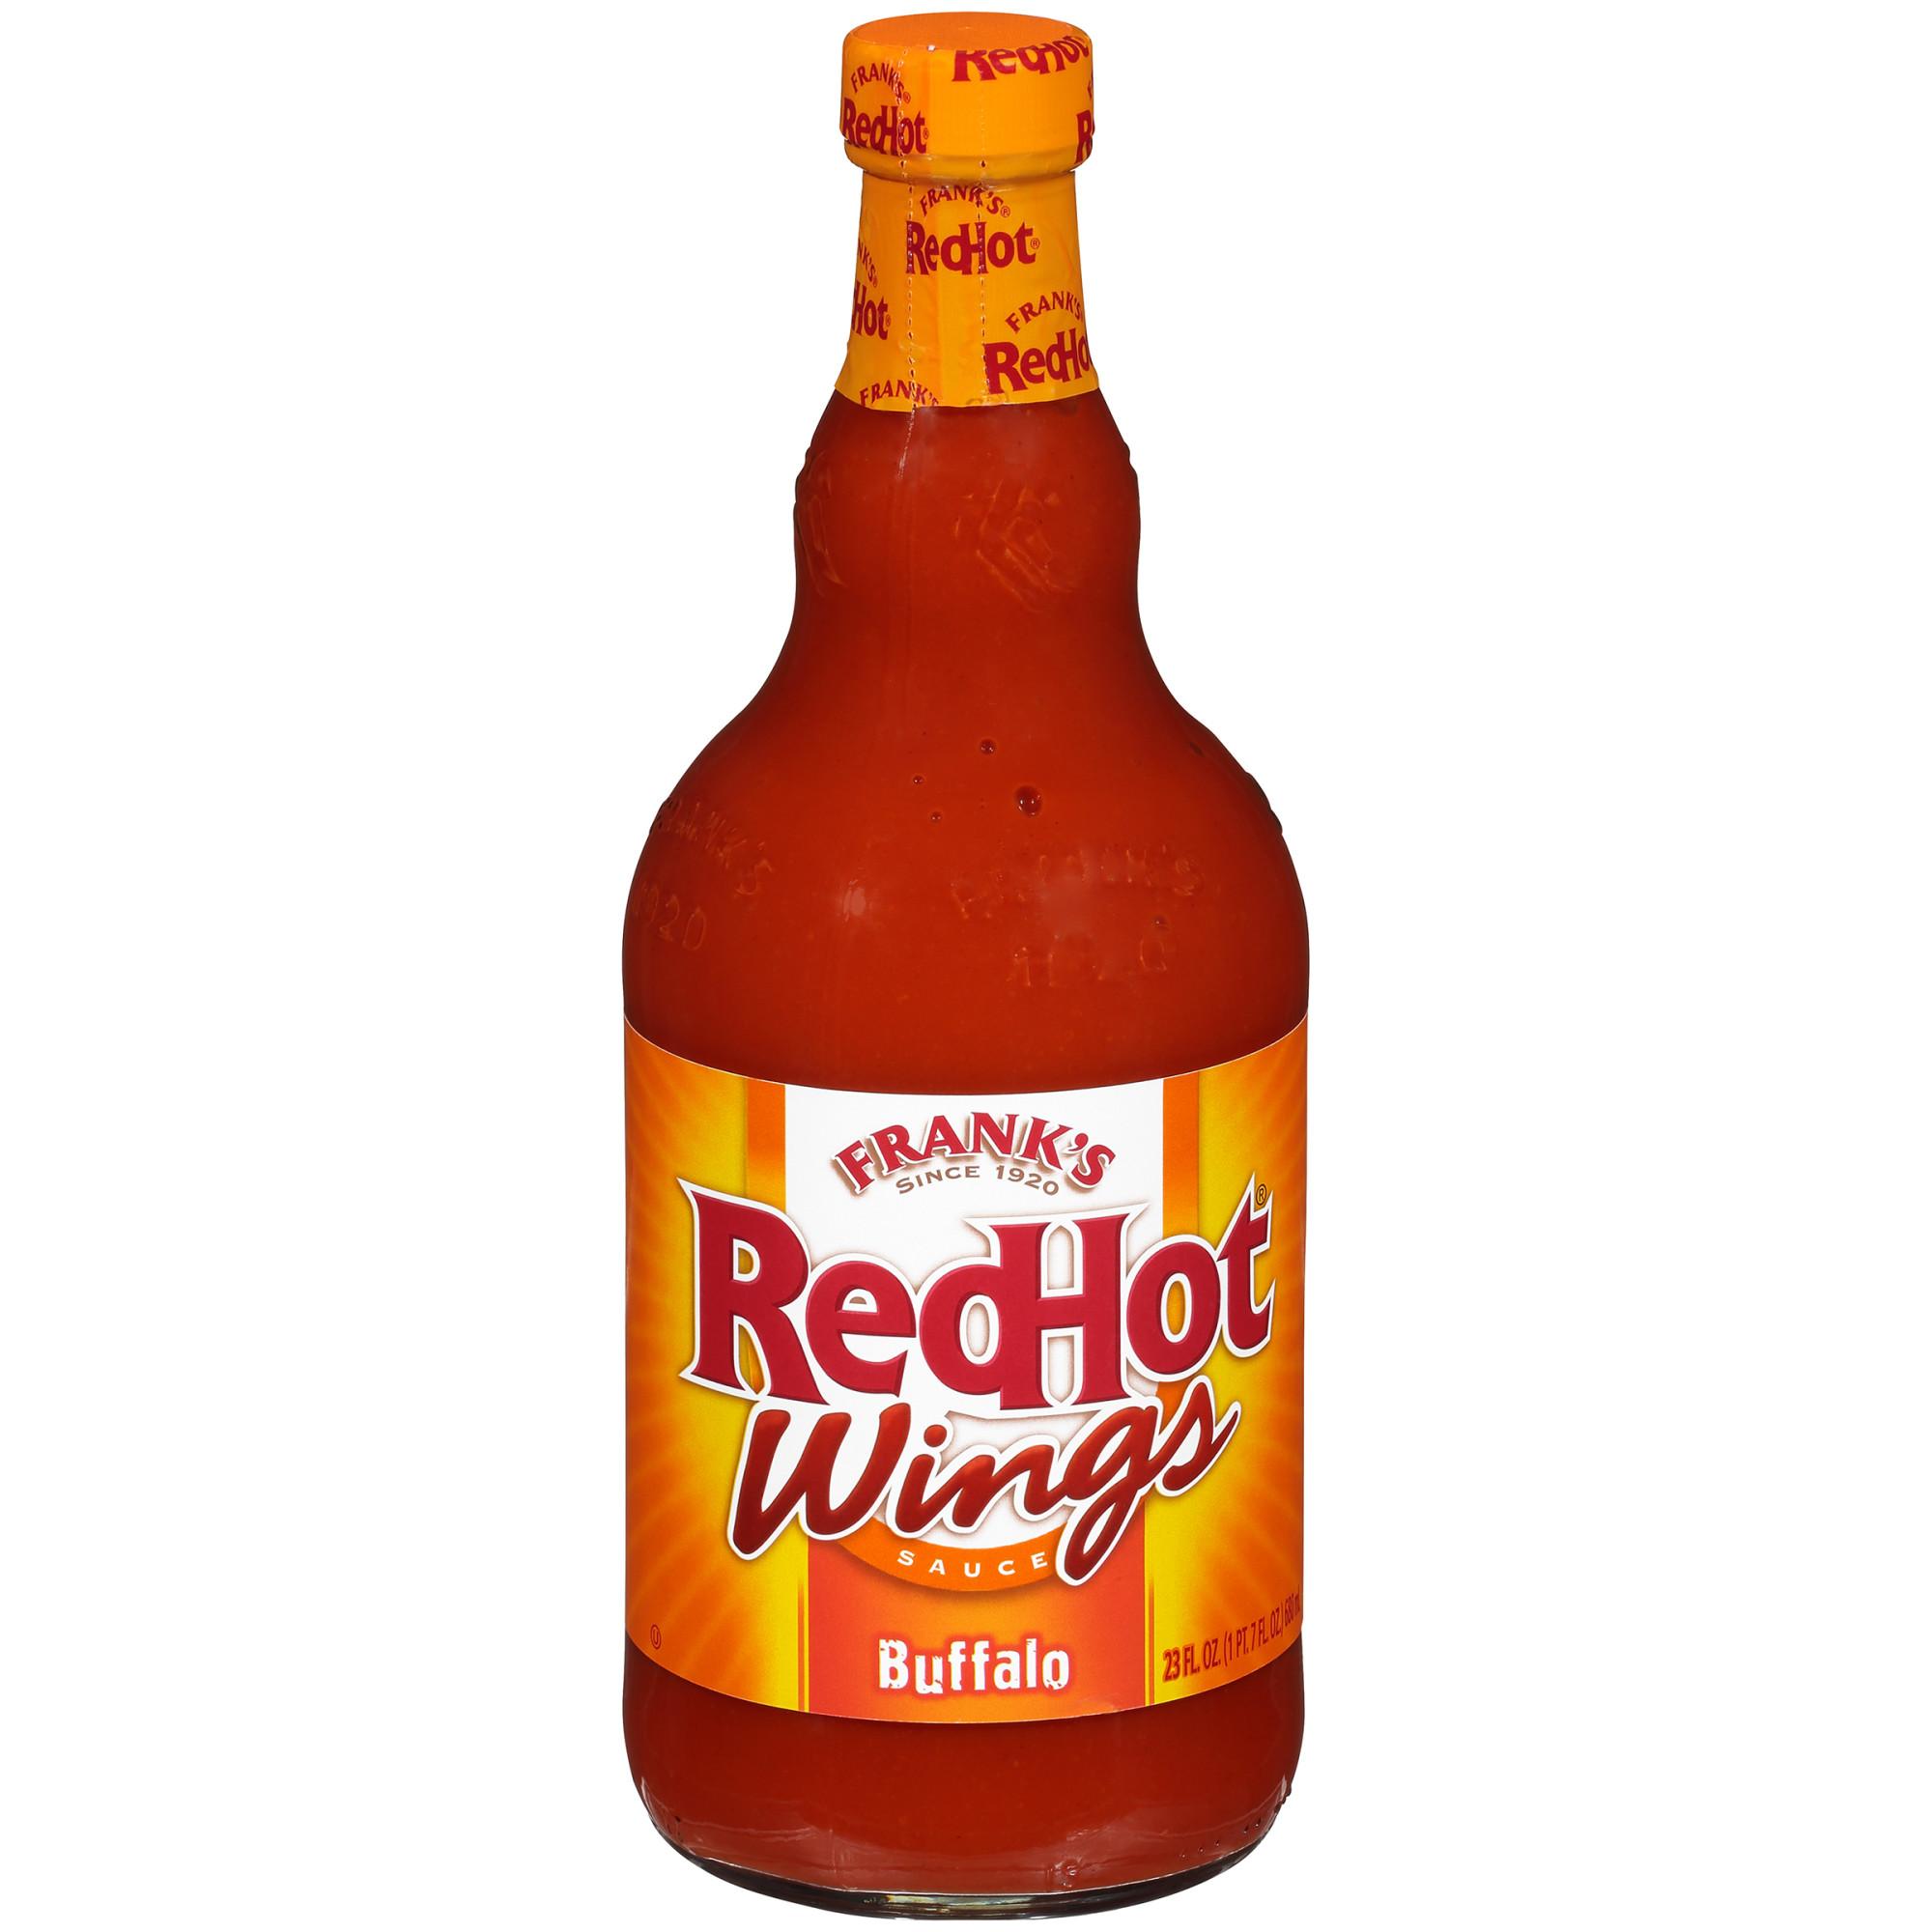 Frank's RedHot Buffalo Wings Sauce, 23 fl oz